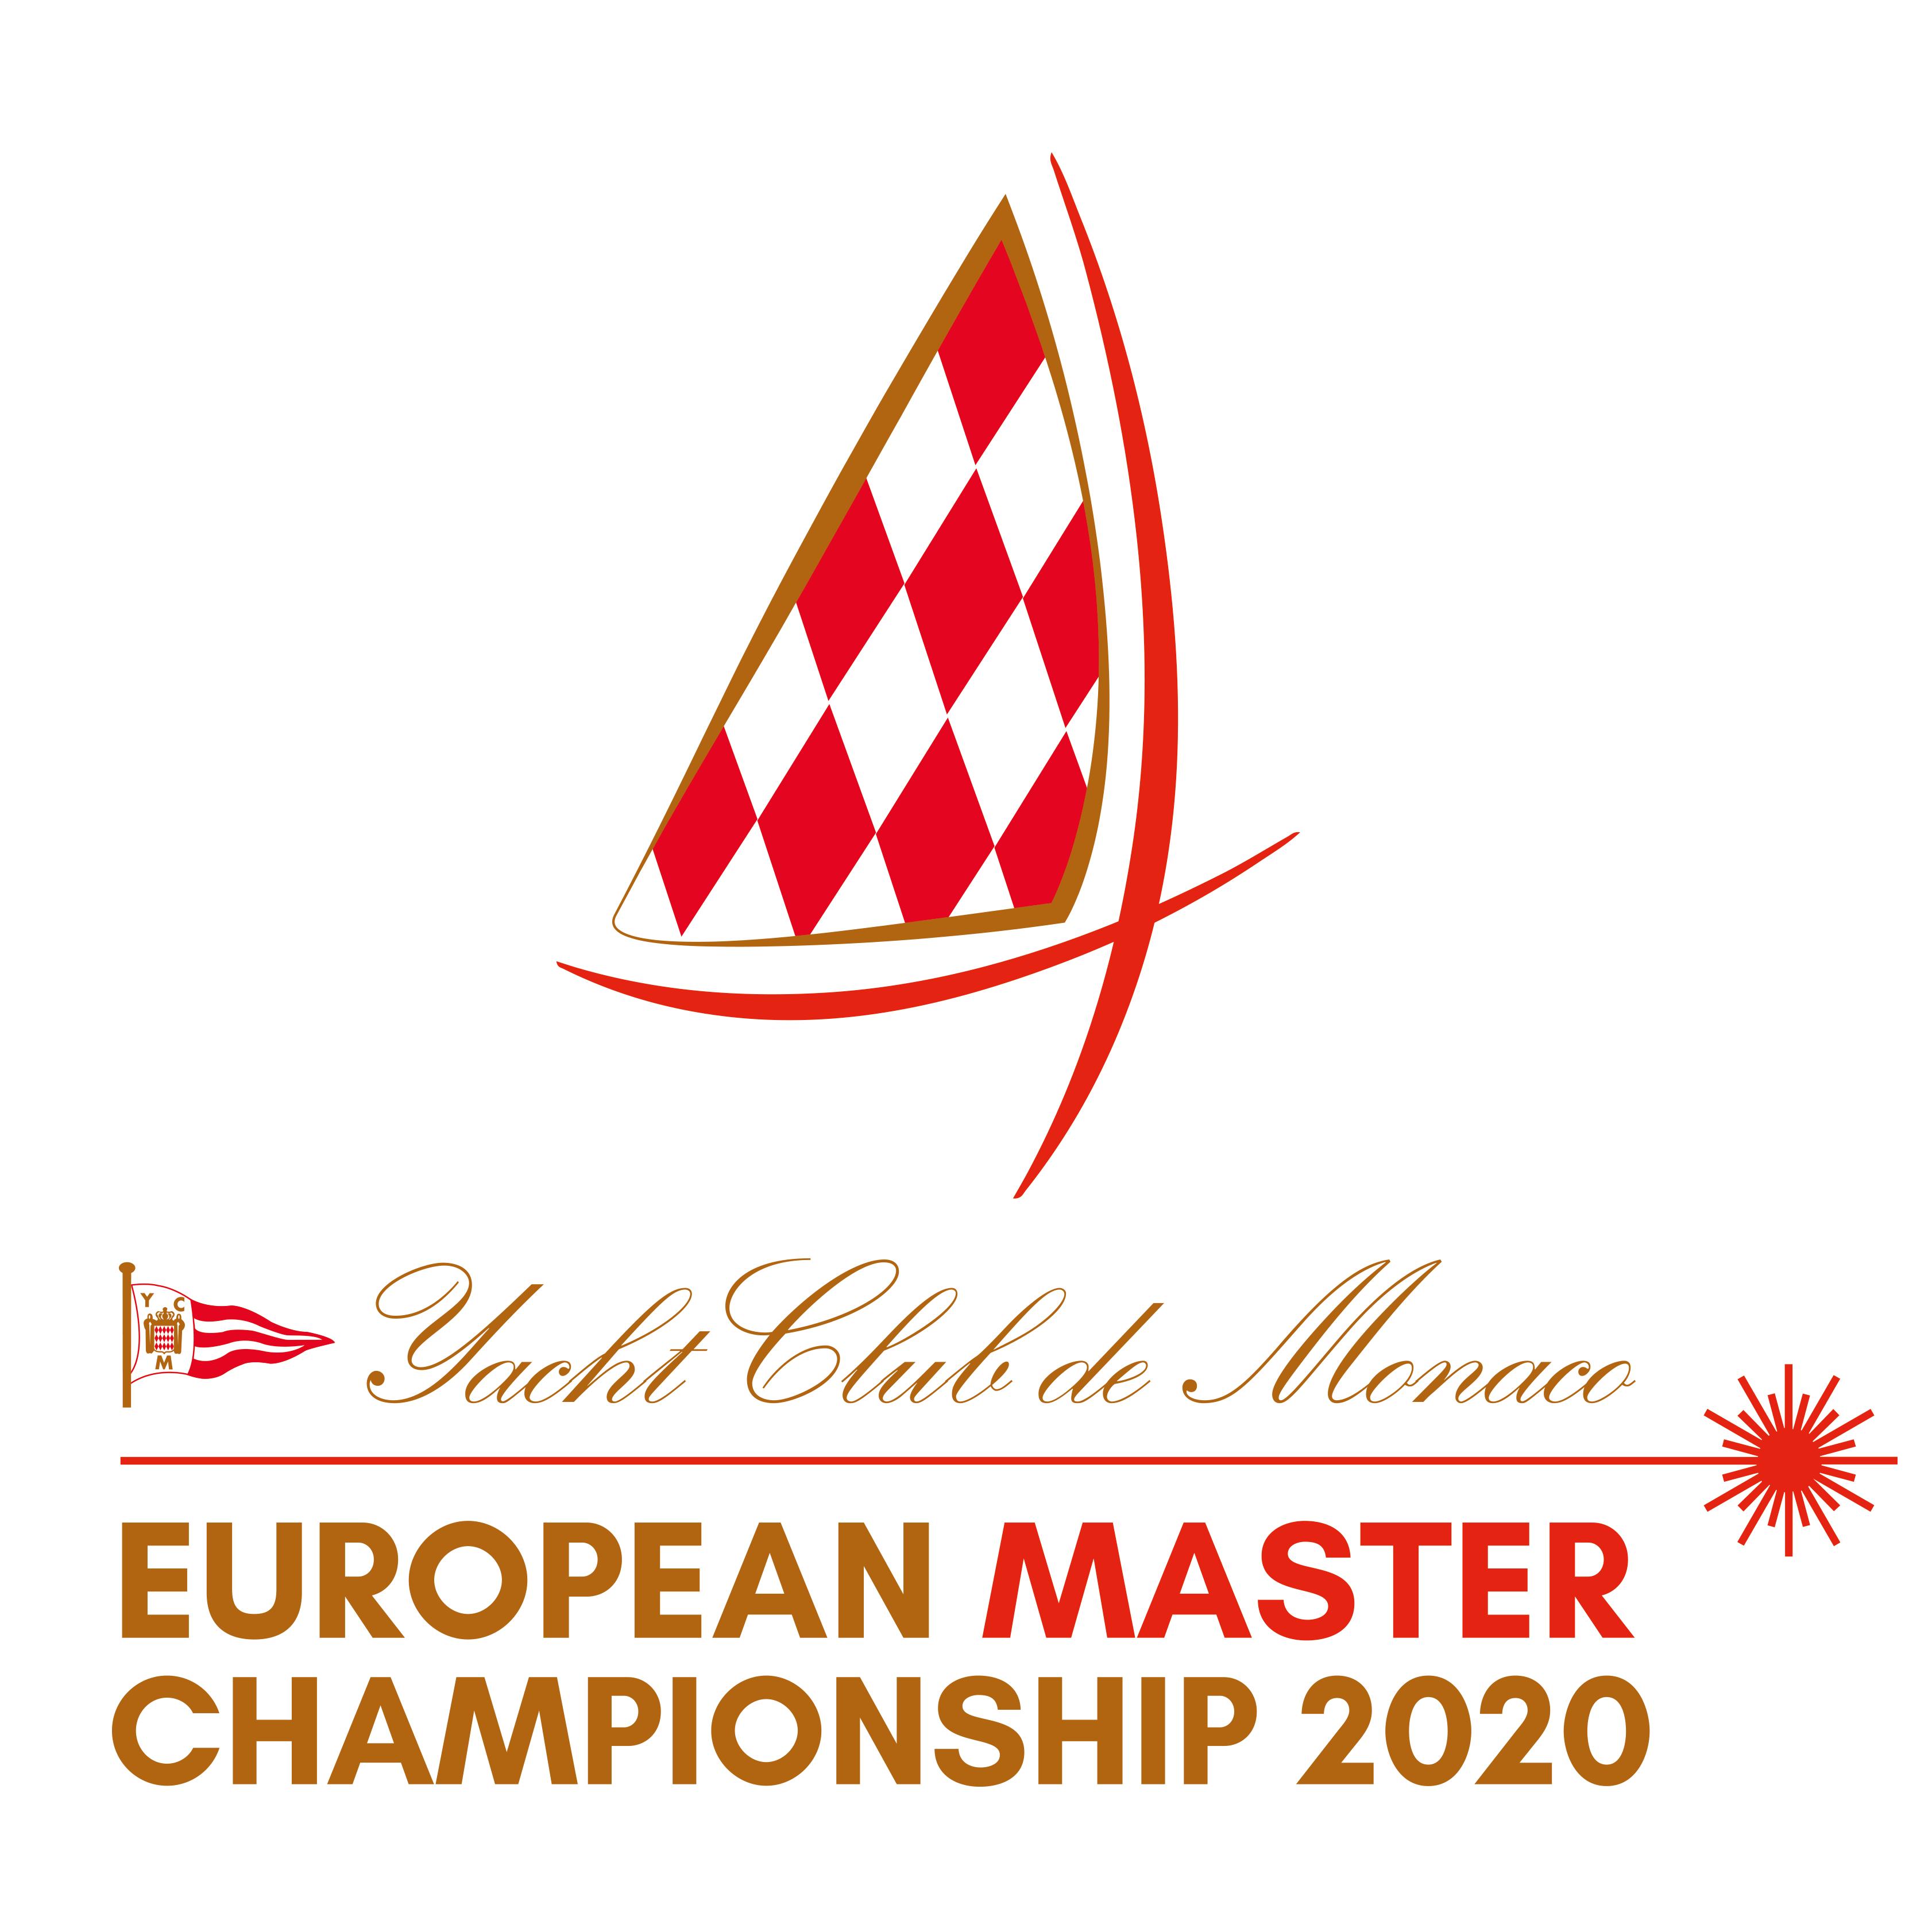 Calendrier Portugal Euro 2020.Laser Class Calendar Eurilca